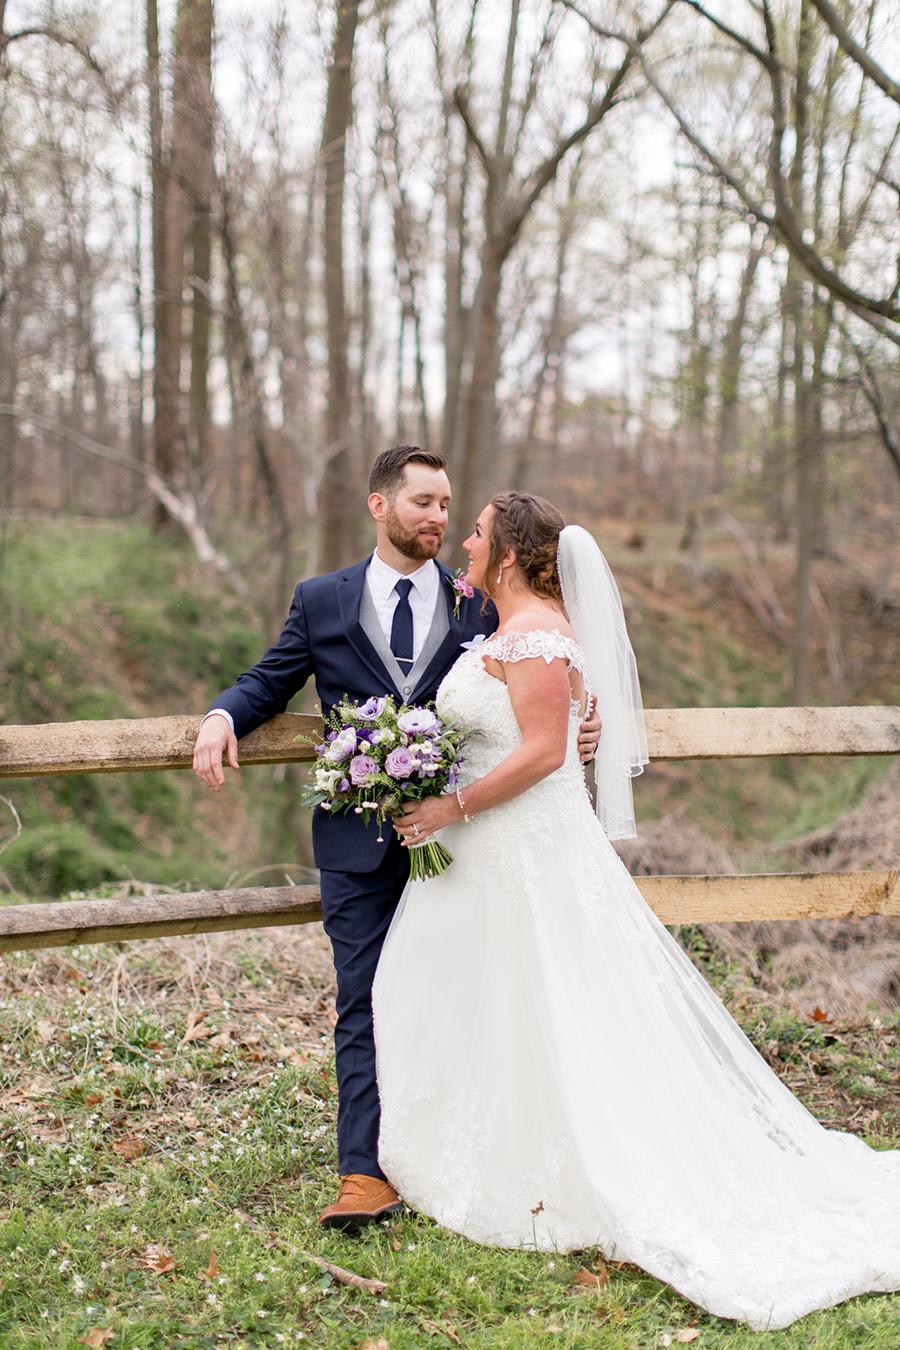 Warner Road Farm Wedding, Pilesgrove NJ